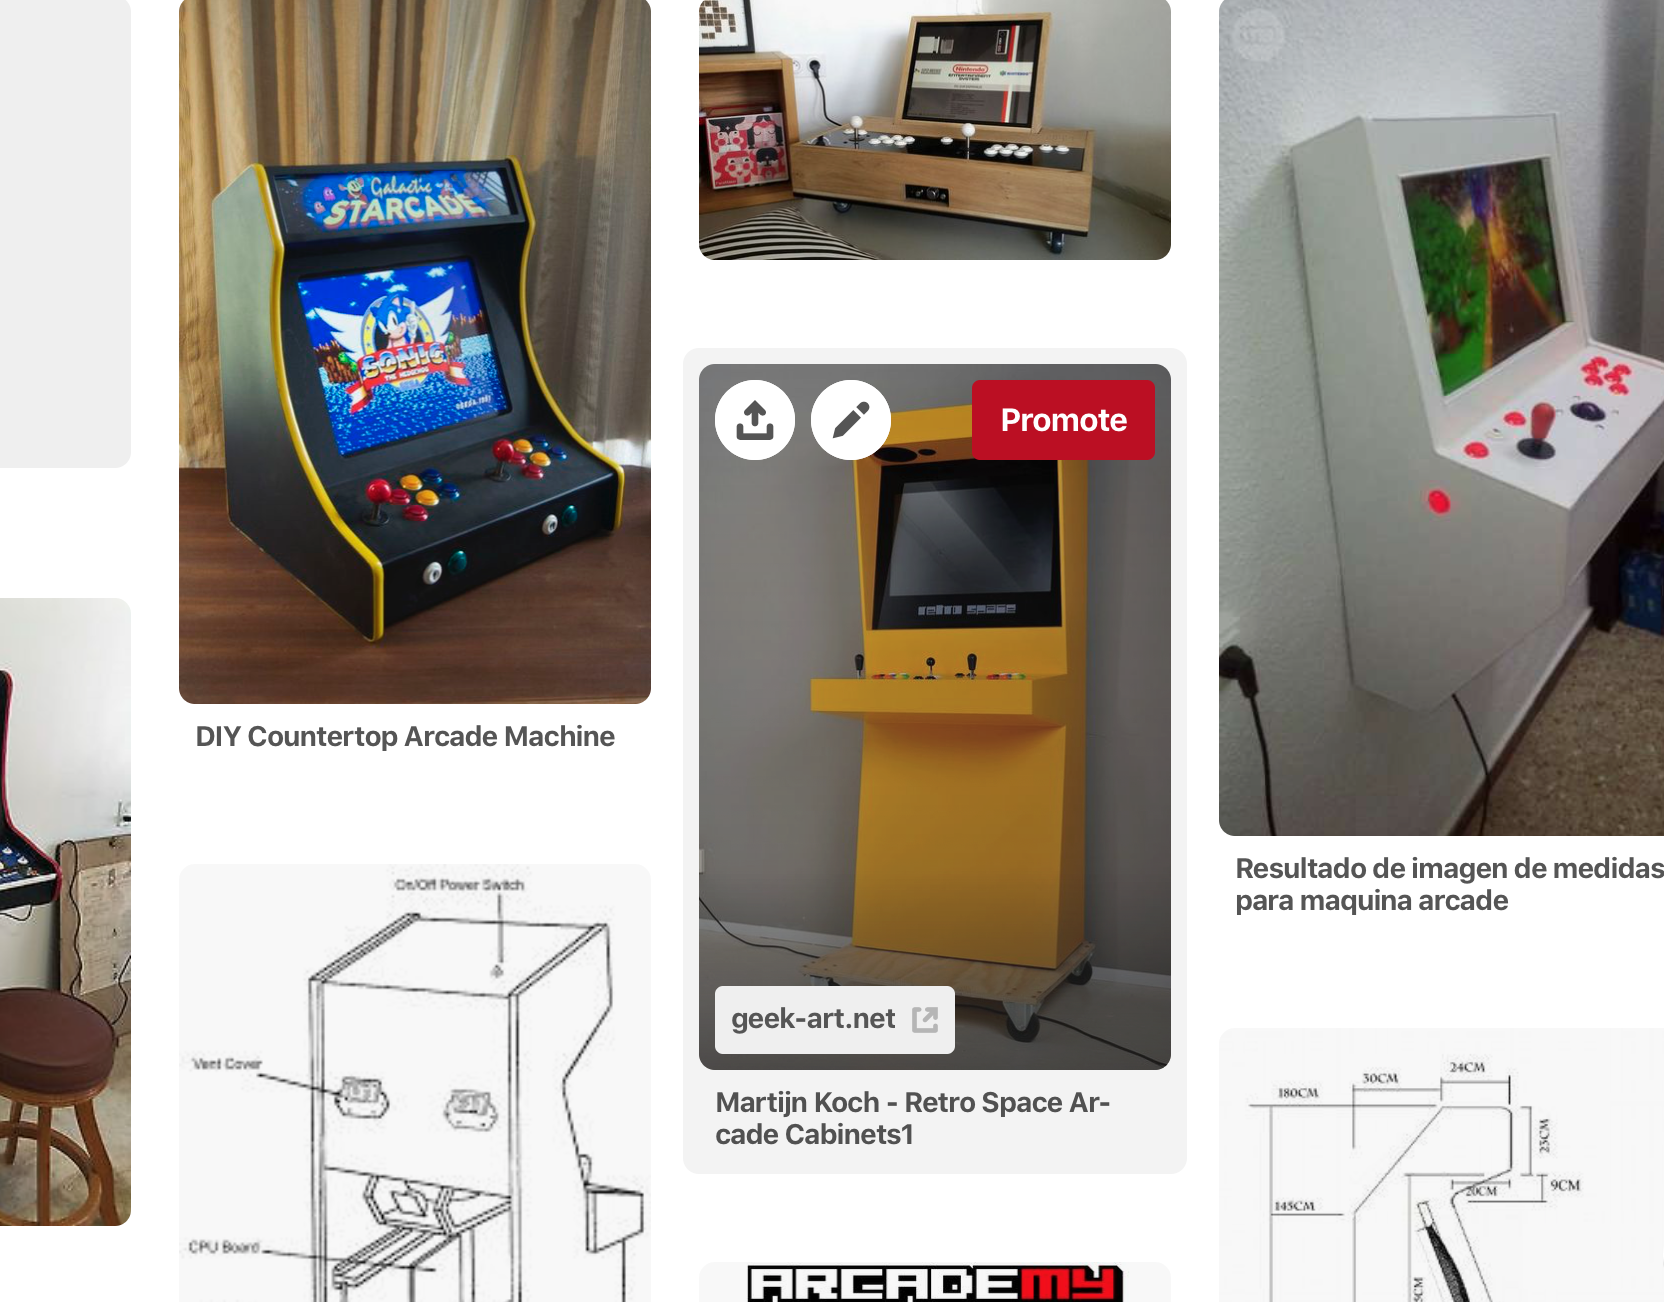 https://www.pinterest.com.au/danny_jarratt/arcade/